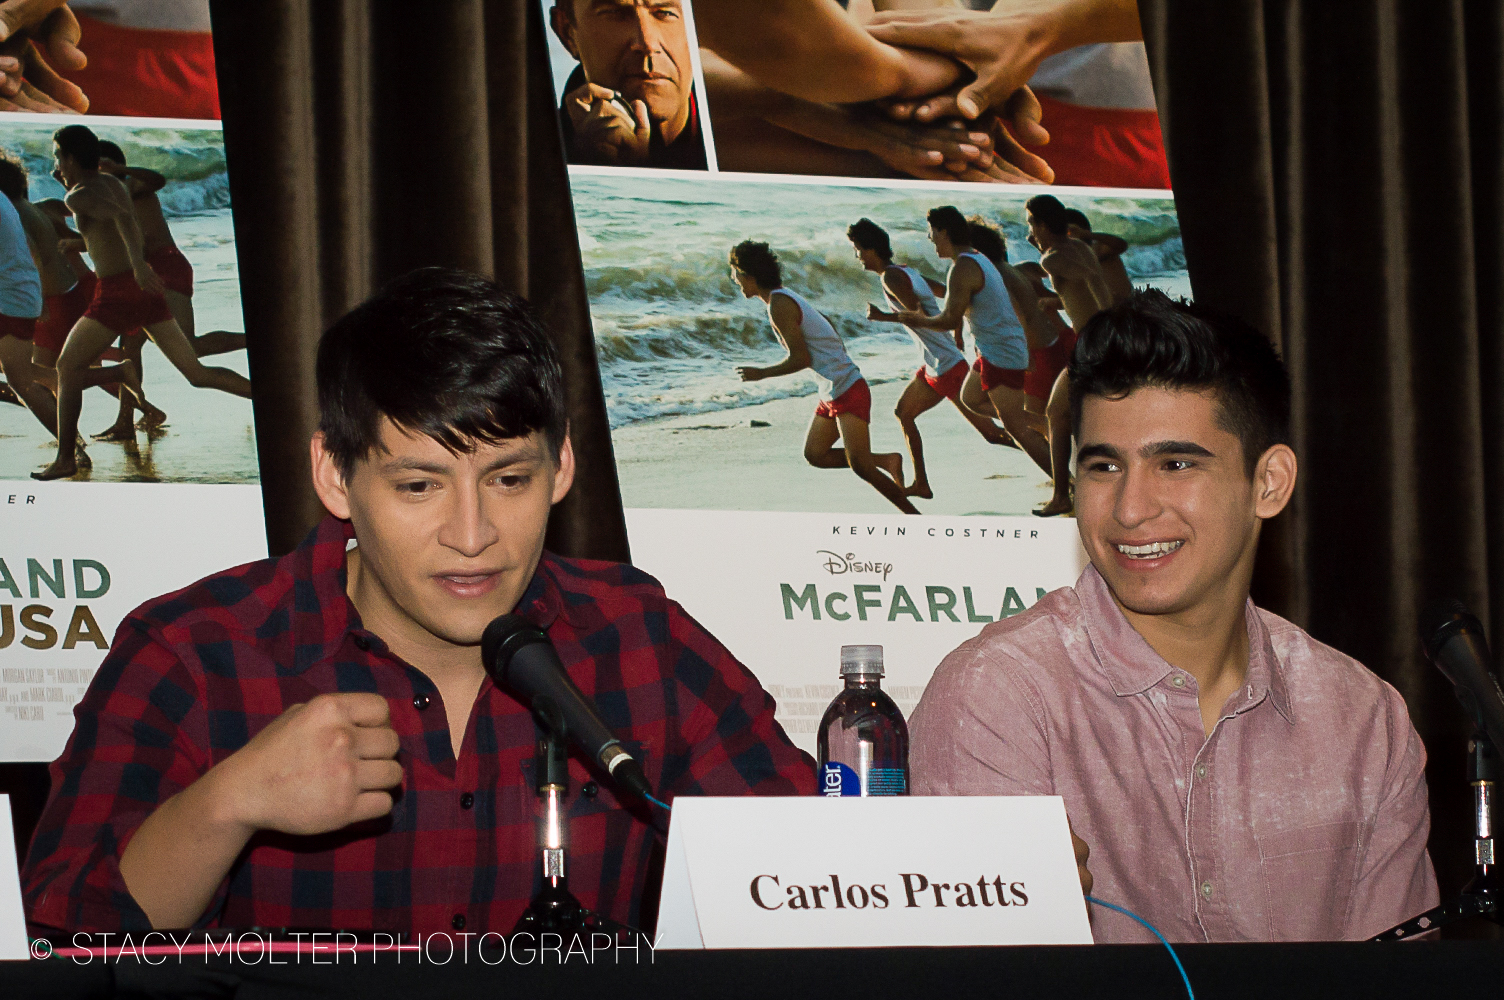 Carlos Pratts & Hector Duran - McFarland USA Press Conference Junket